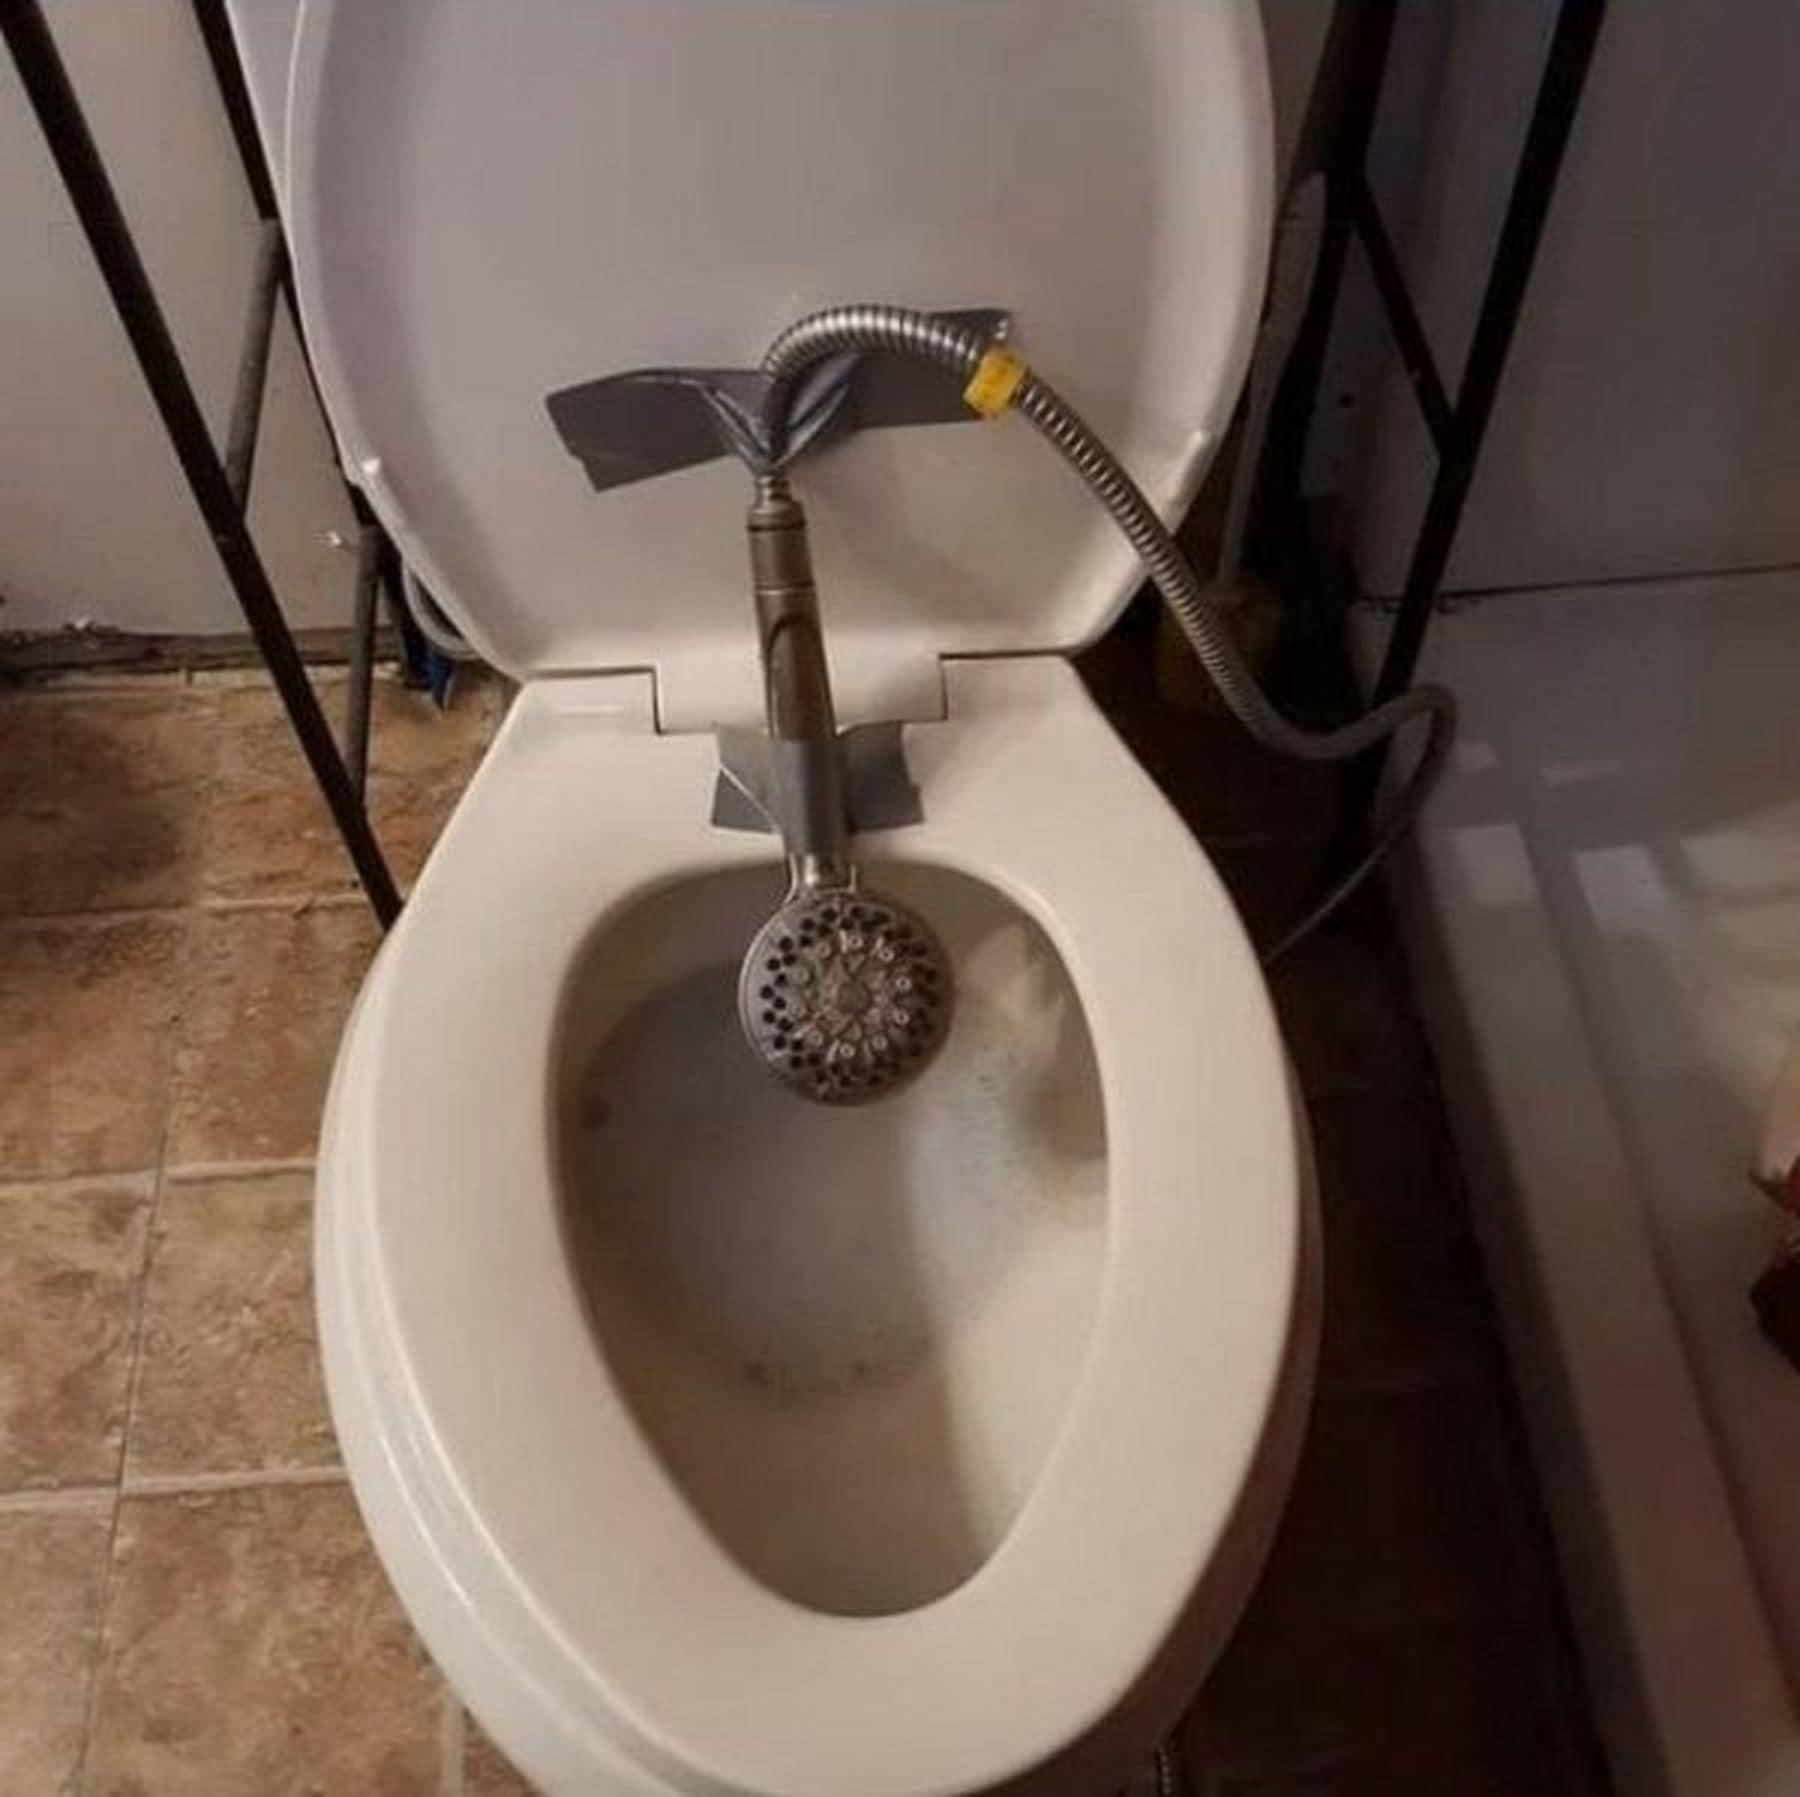 Dusch-WC Marke Eigenbau | Lustiges | Was is hier eigentlich los?